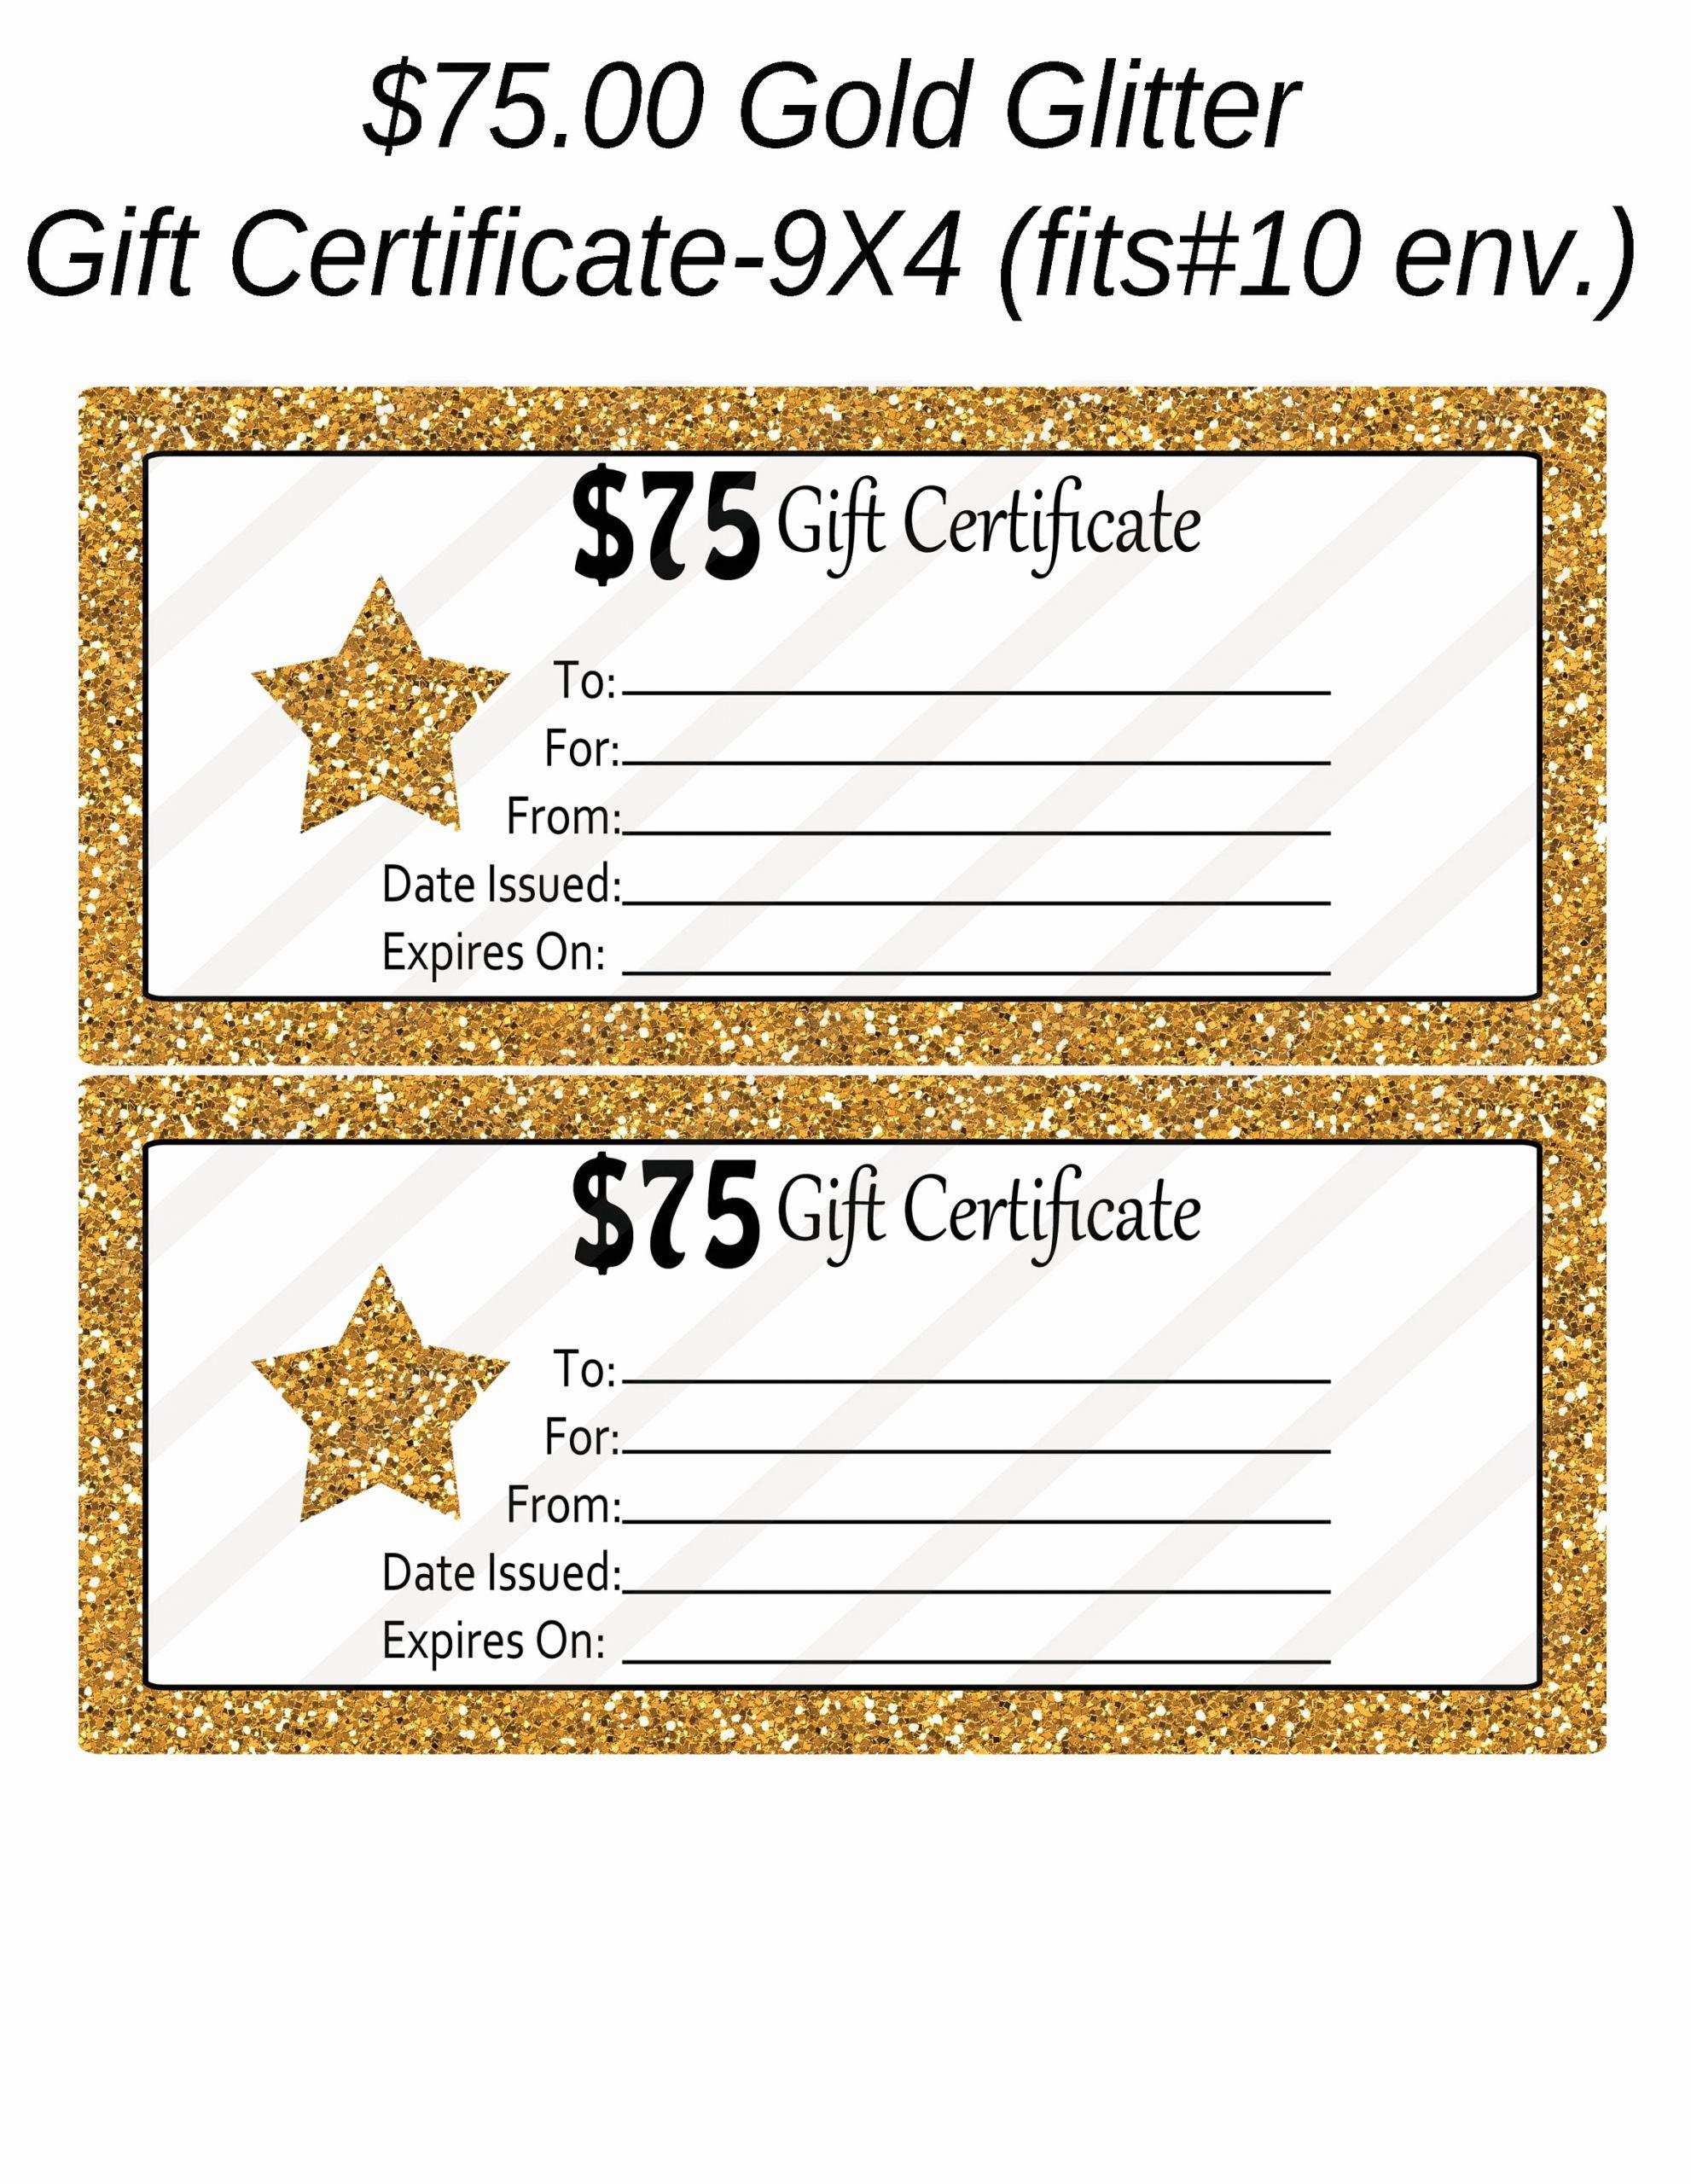 Money Gift Certificate Template Elegant Gift Certificate Goldstar Gift Certificate Template Money Gift Certificate Templates Full page gift certificate template